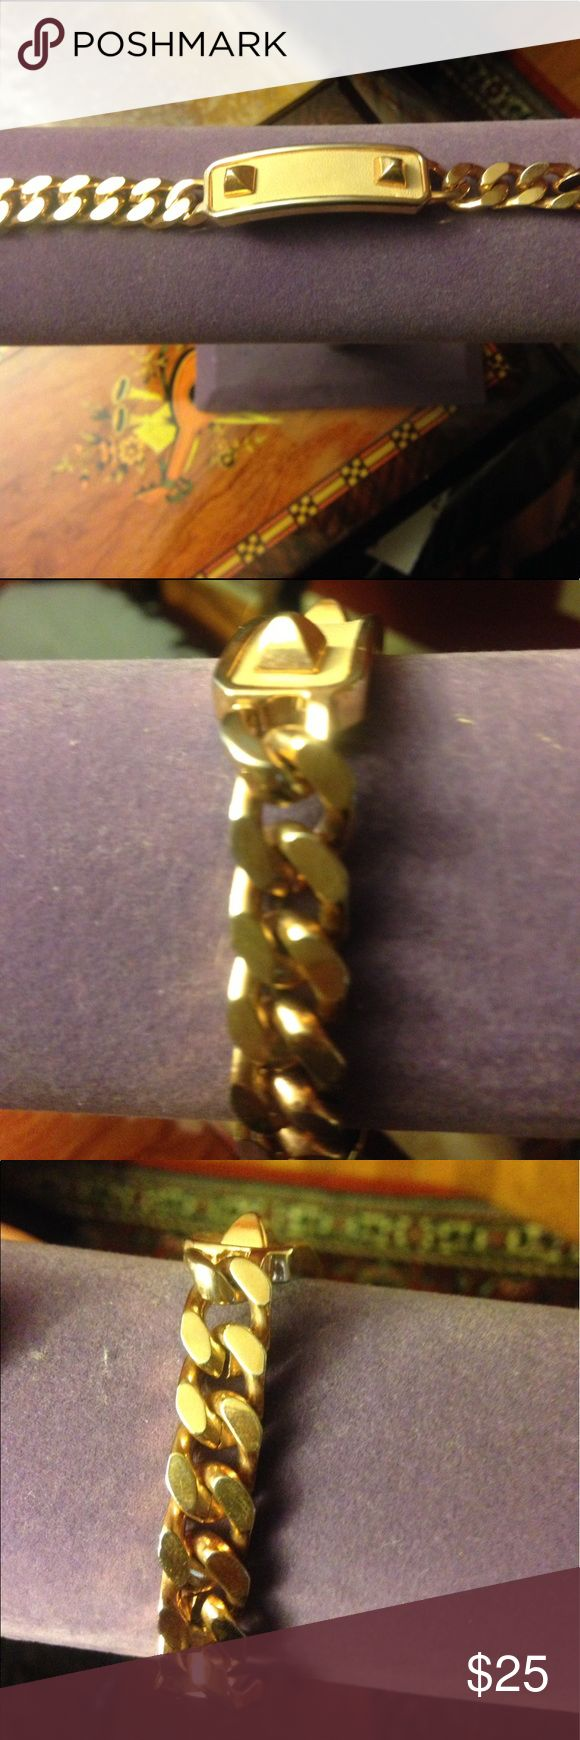 "Vince Camuto Rose Gold Chain Bracelet Vince Camuto Rose Gold Chain bracelet.            Size 7 1/2"" Vince Camuto Jewelry Bracelets"